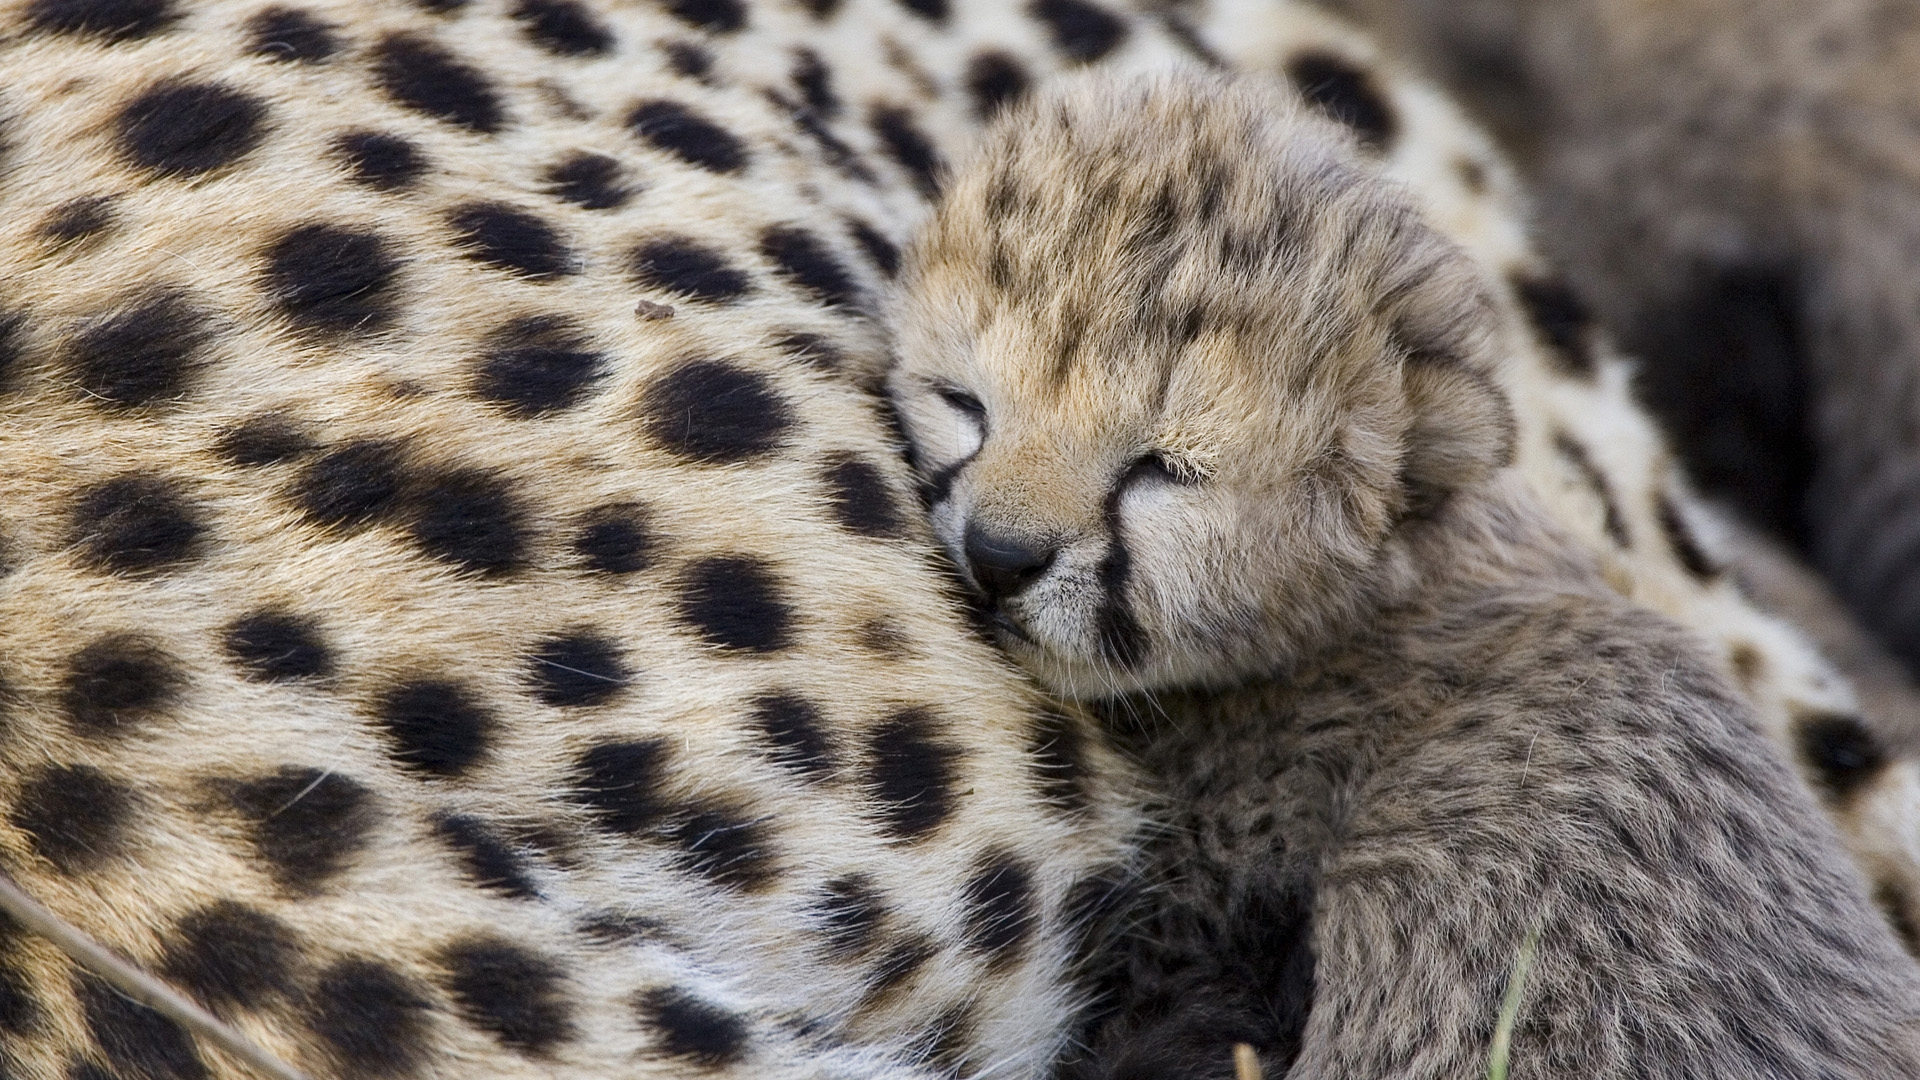 Baby Cheetah Wallpapers Group (68+)